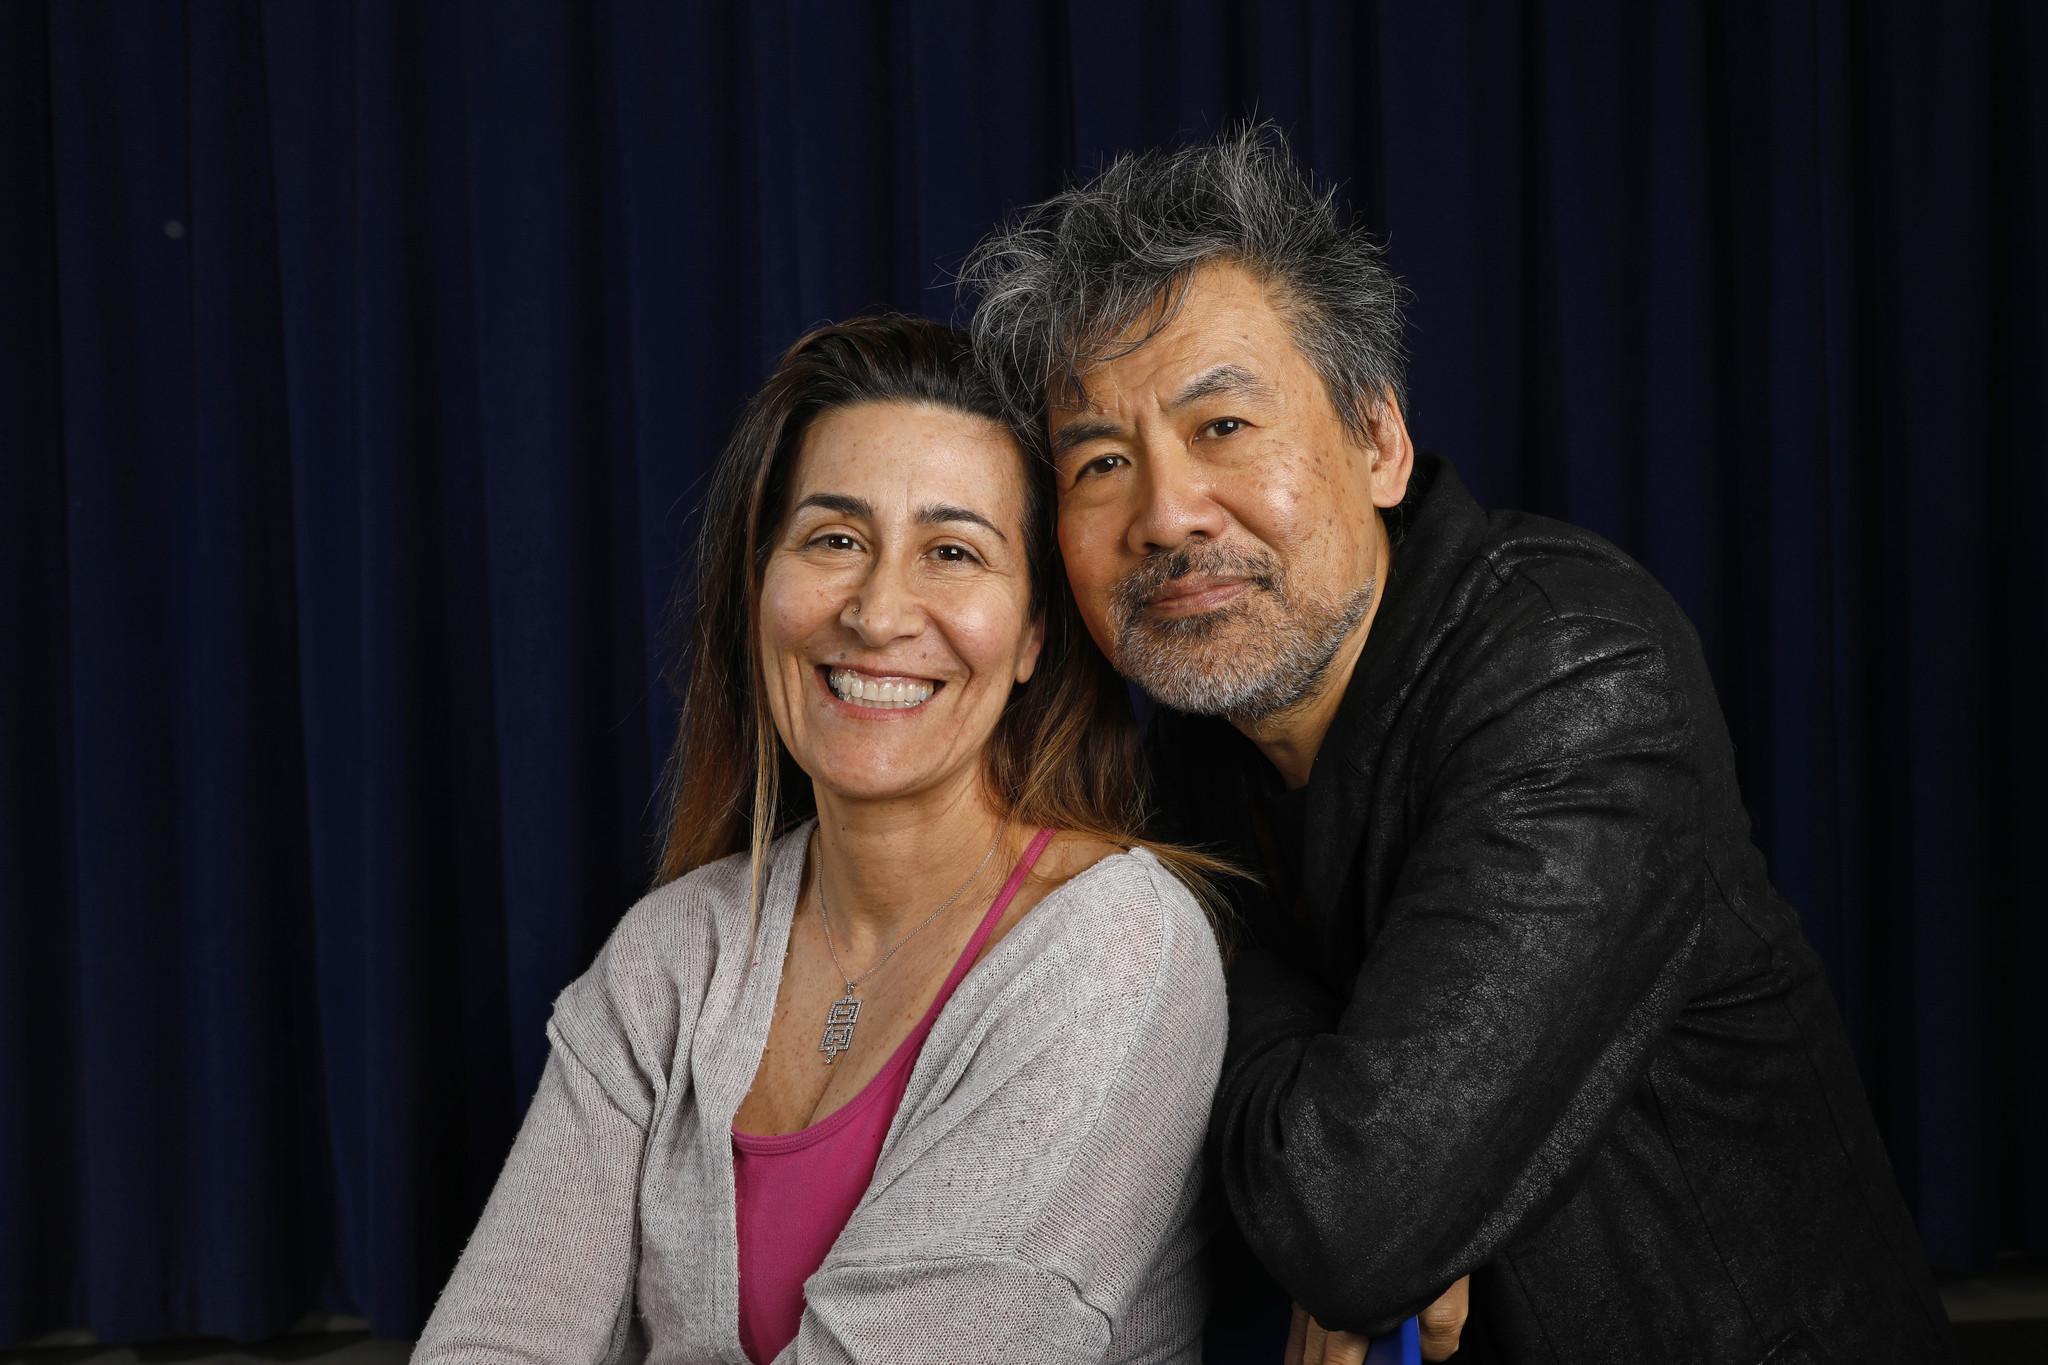 David Henry Hwang and Jeanine Tesori